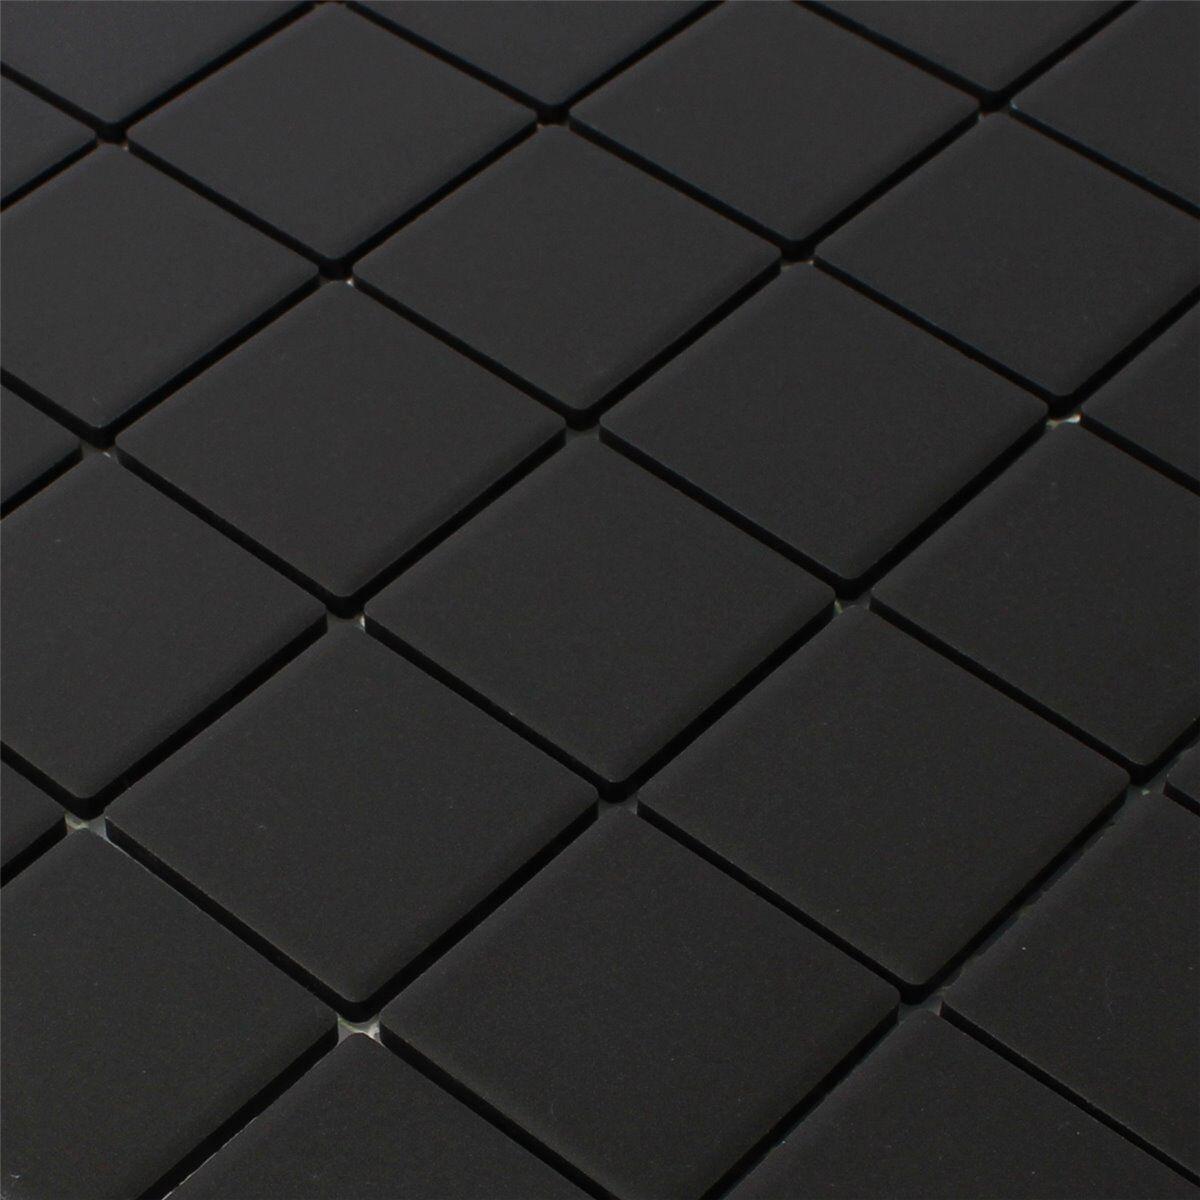 keramik mosaik fliesen schwarz uni rutschhemmend unglasiert eur 4 00 picclick de. Black Bedroom Furniture Sets. Home Design Ideas